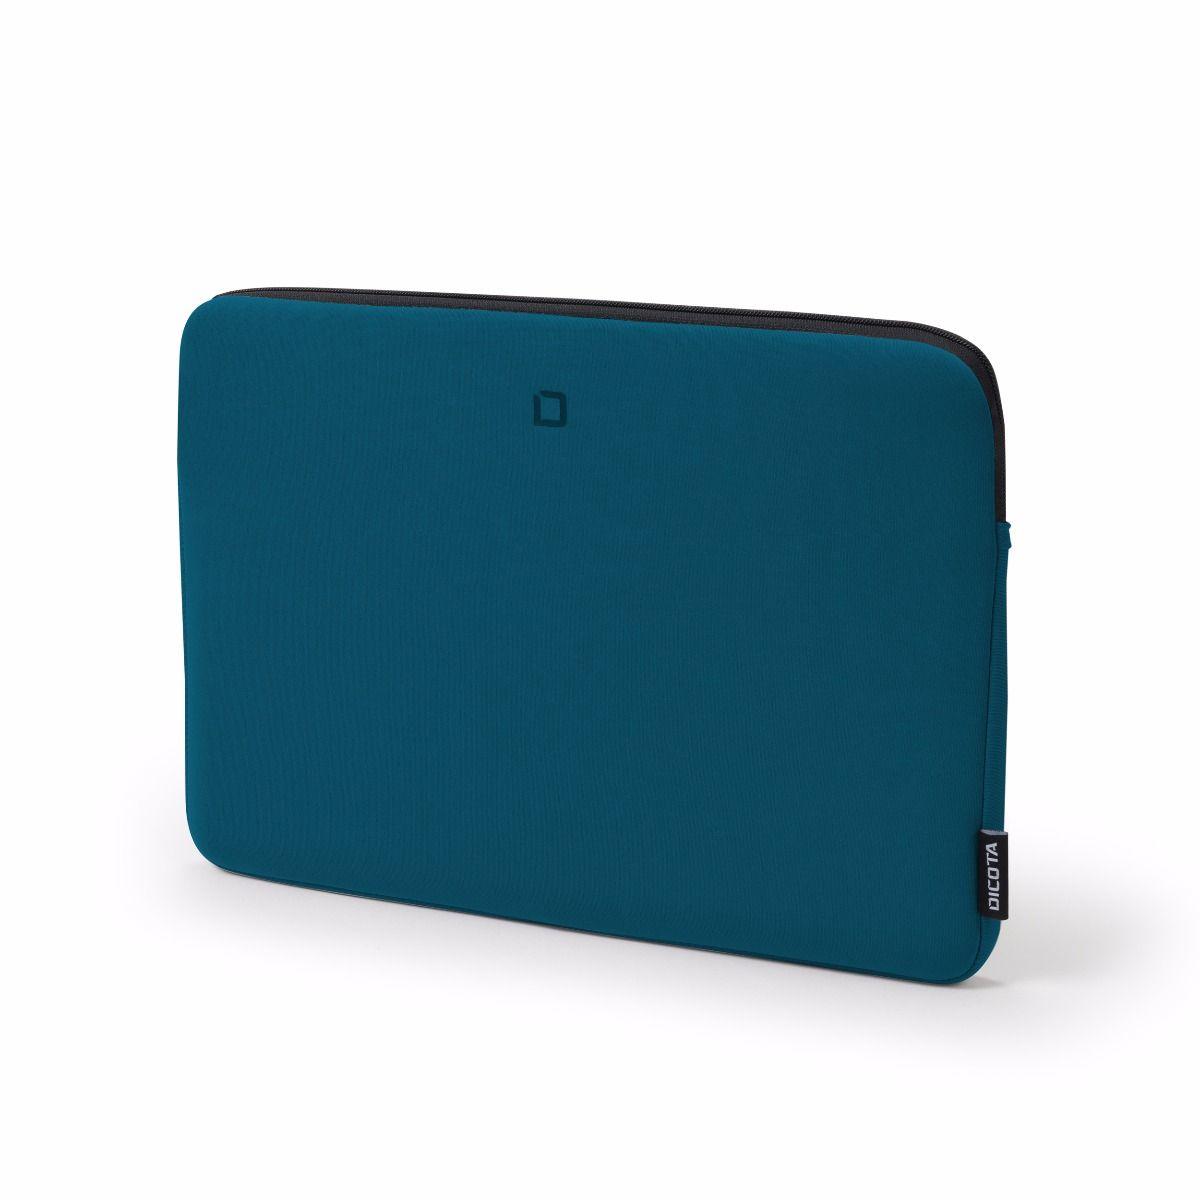 "Dicota Slim Case Base 15-15.6 39.6 cm (15.6"") Sleeve case Blue"